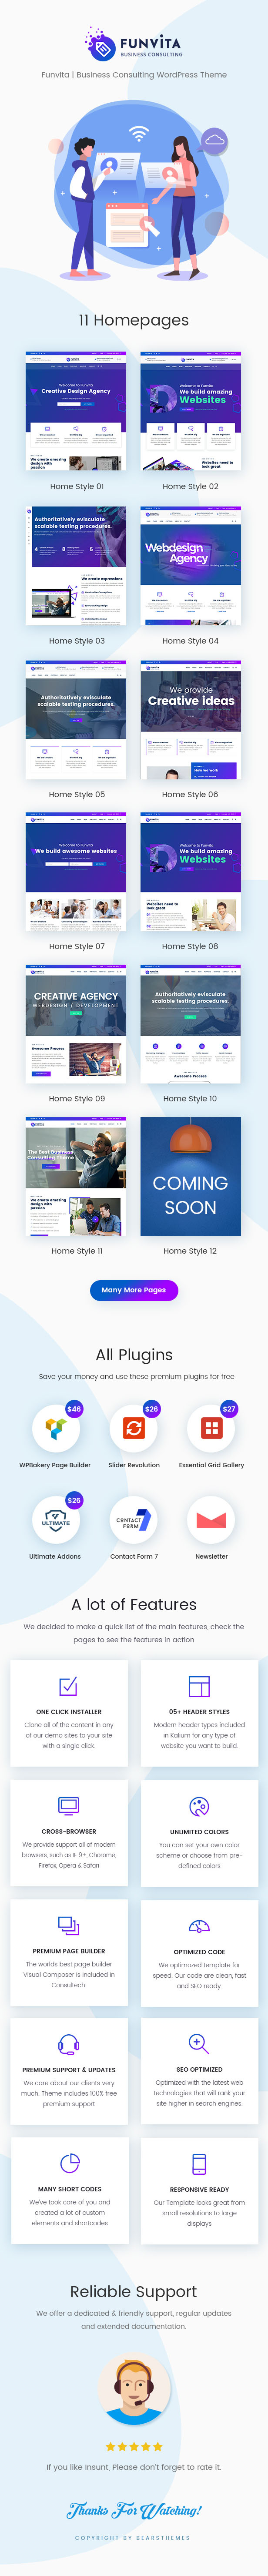 Funvita   Unternehmensberatung WordPress Theme - 2